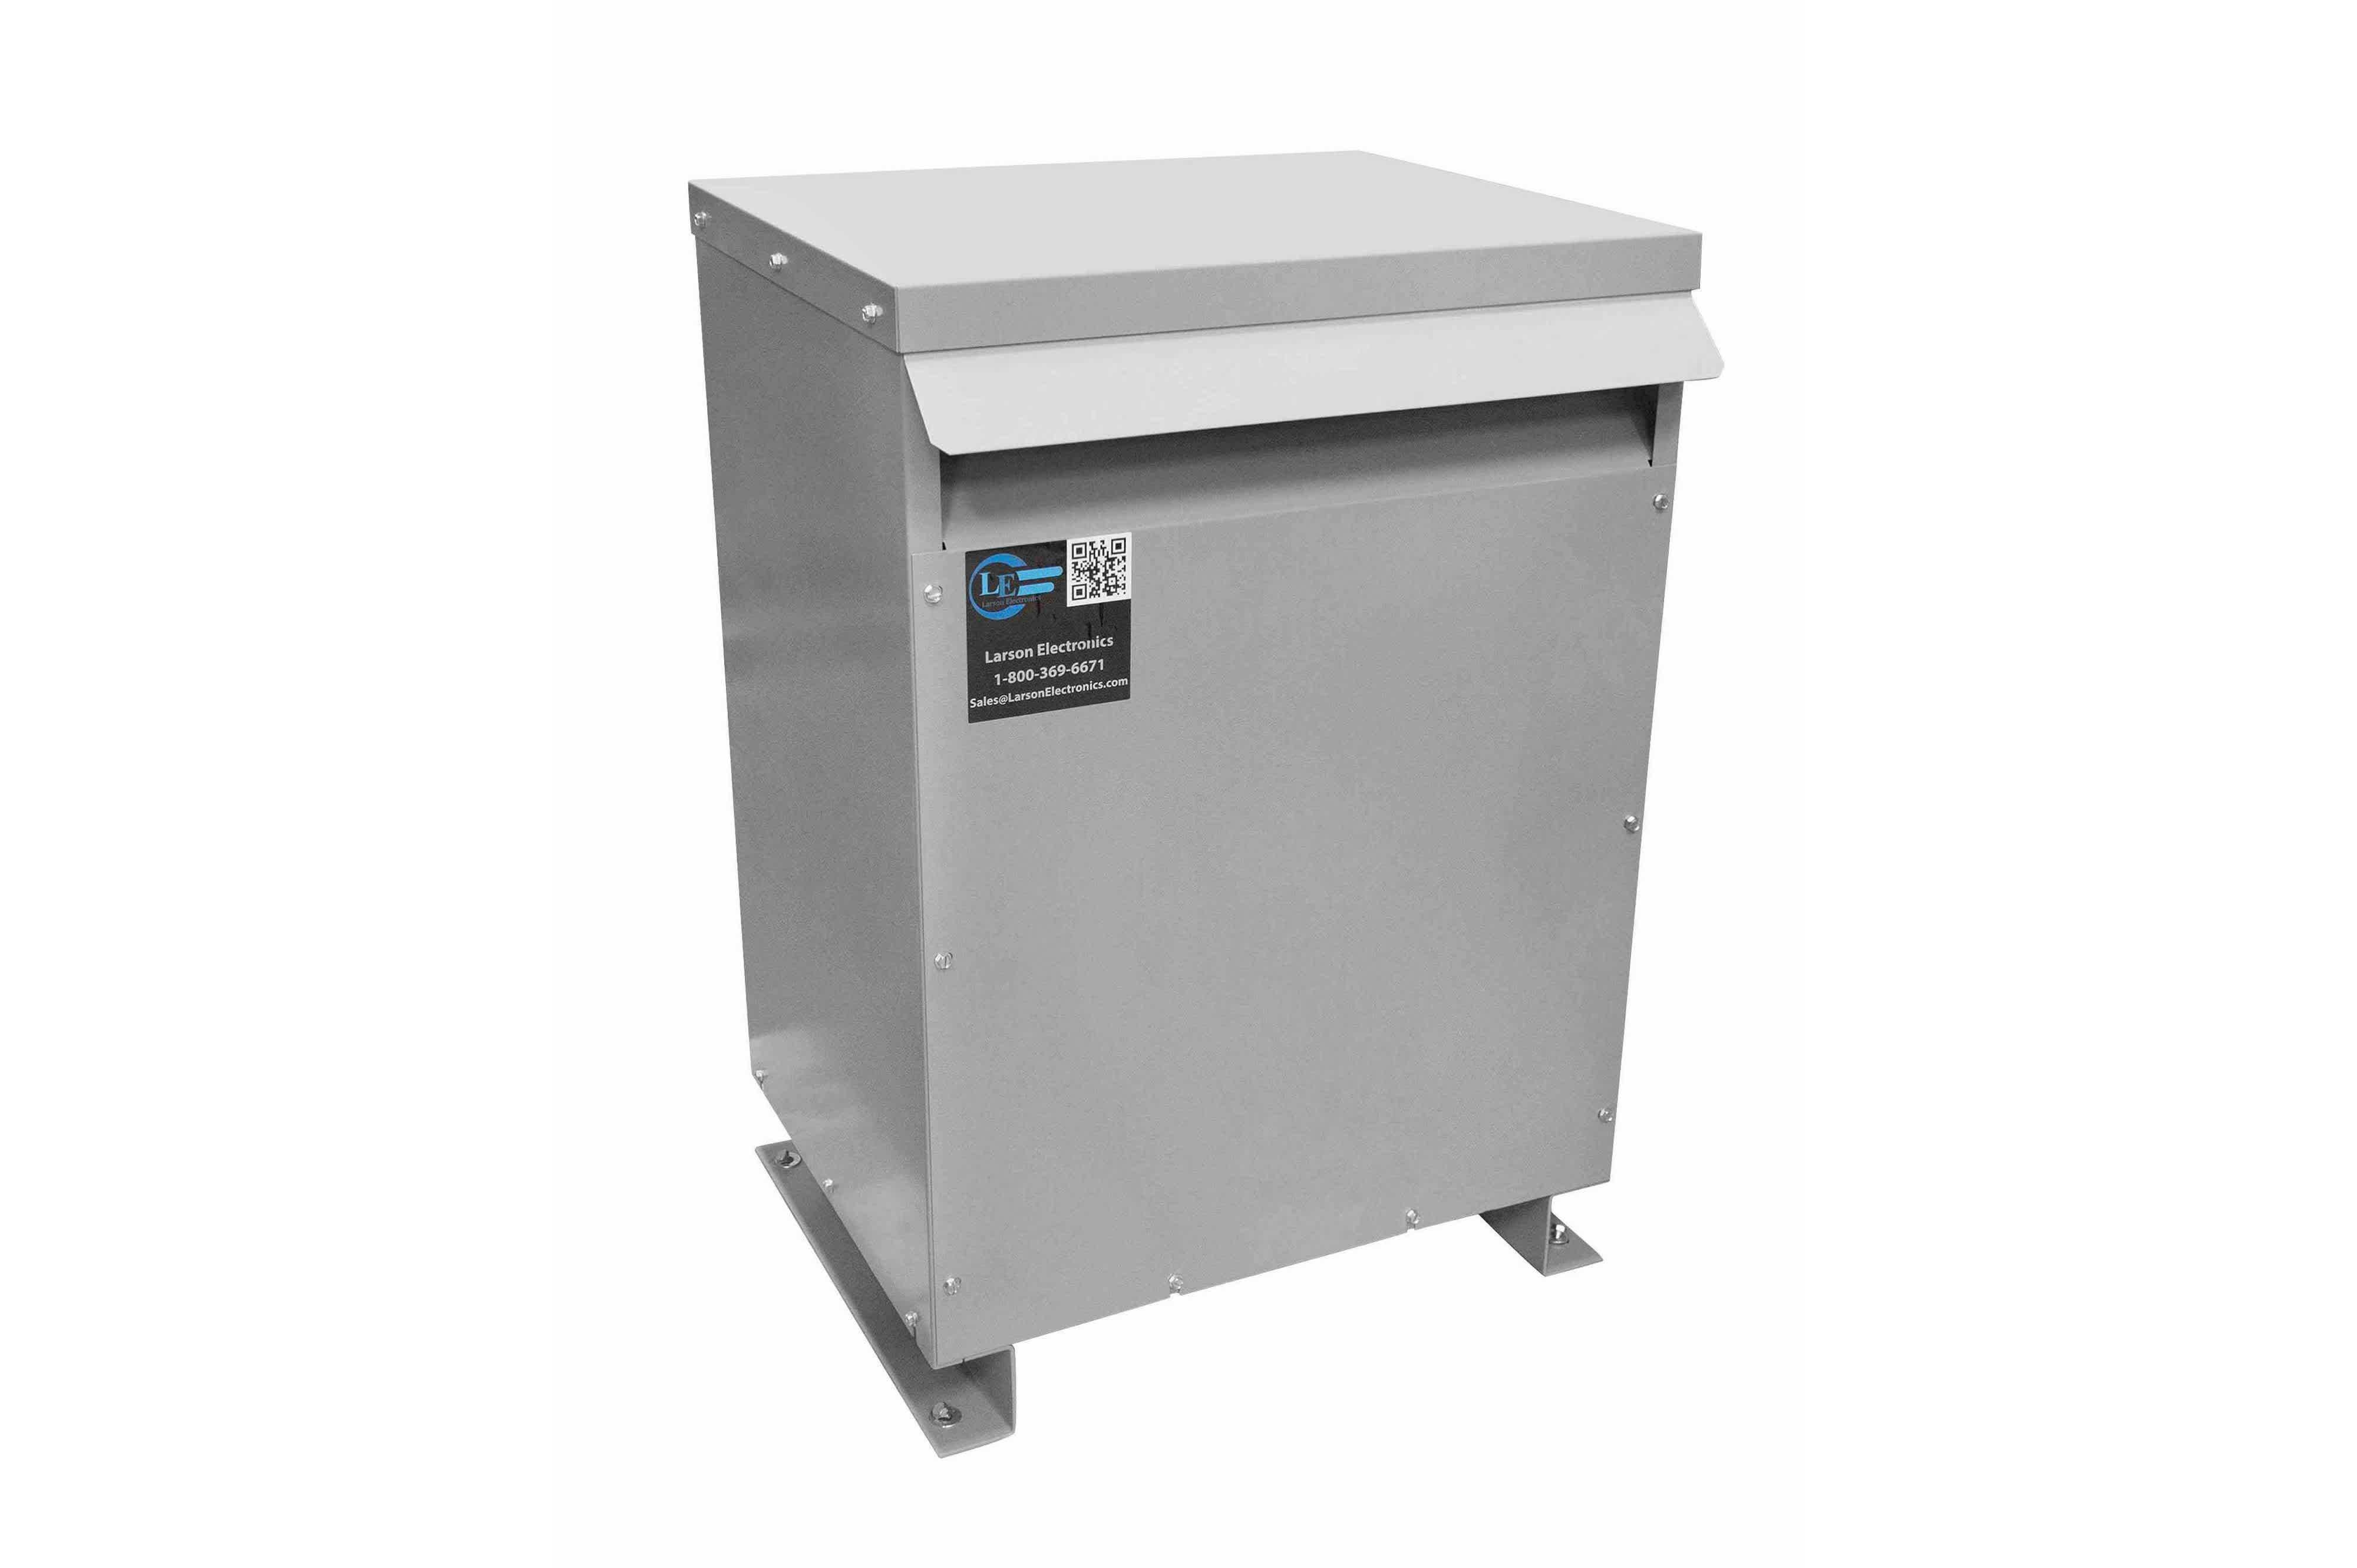 100 kVA 3PH Isolation Transformer, 460V Wye Primary, 240V/120 Delta Secondary, N3R, Ventilated, 60 Hz